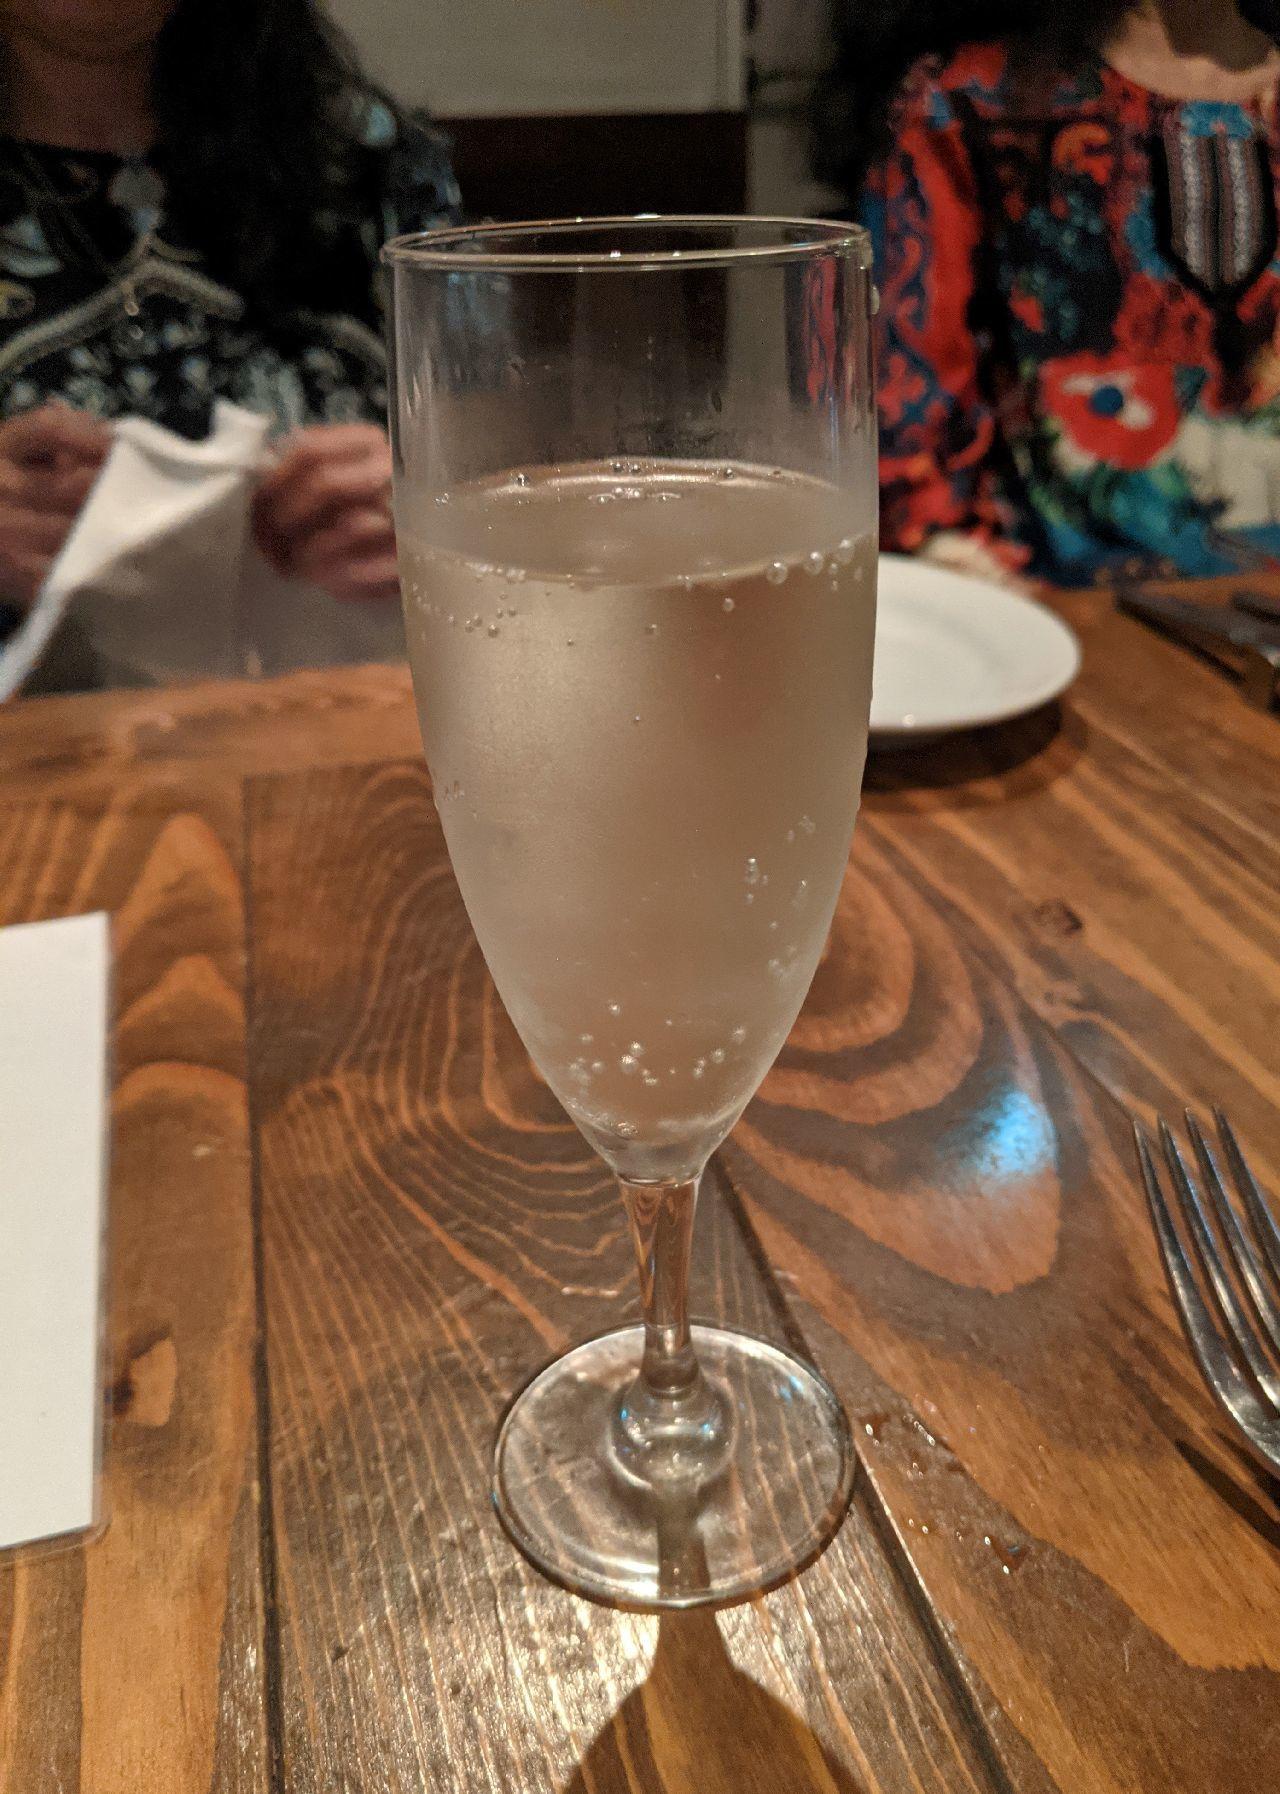 PXL_20210630_104217556スパークリングワイン